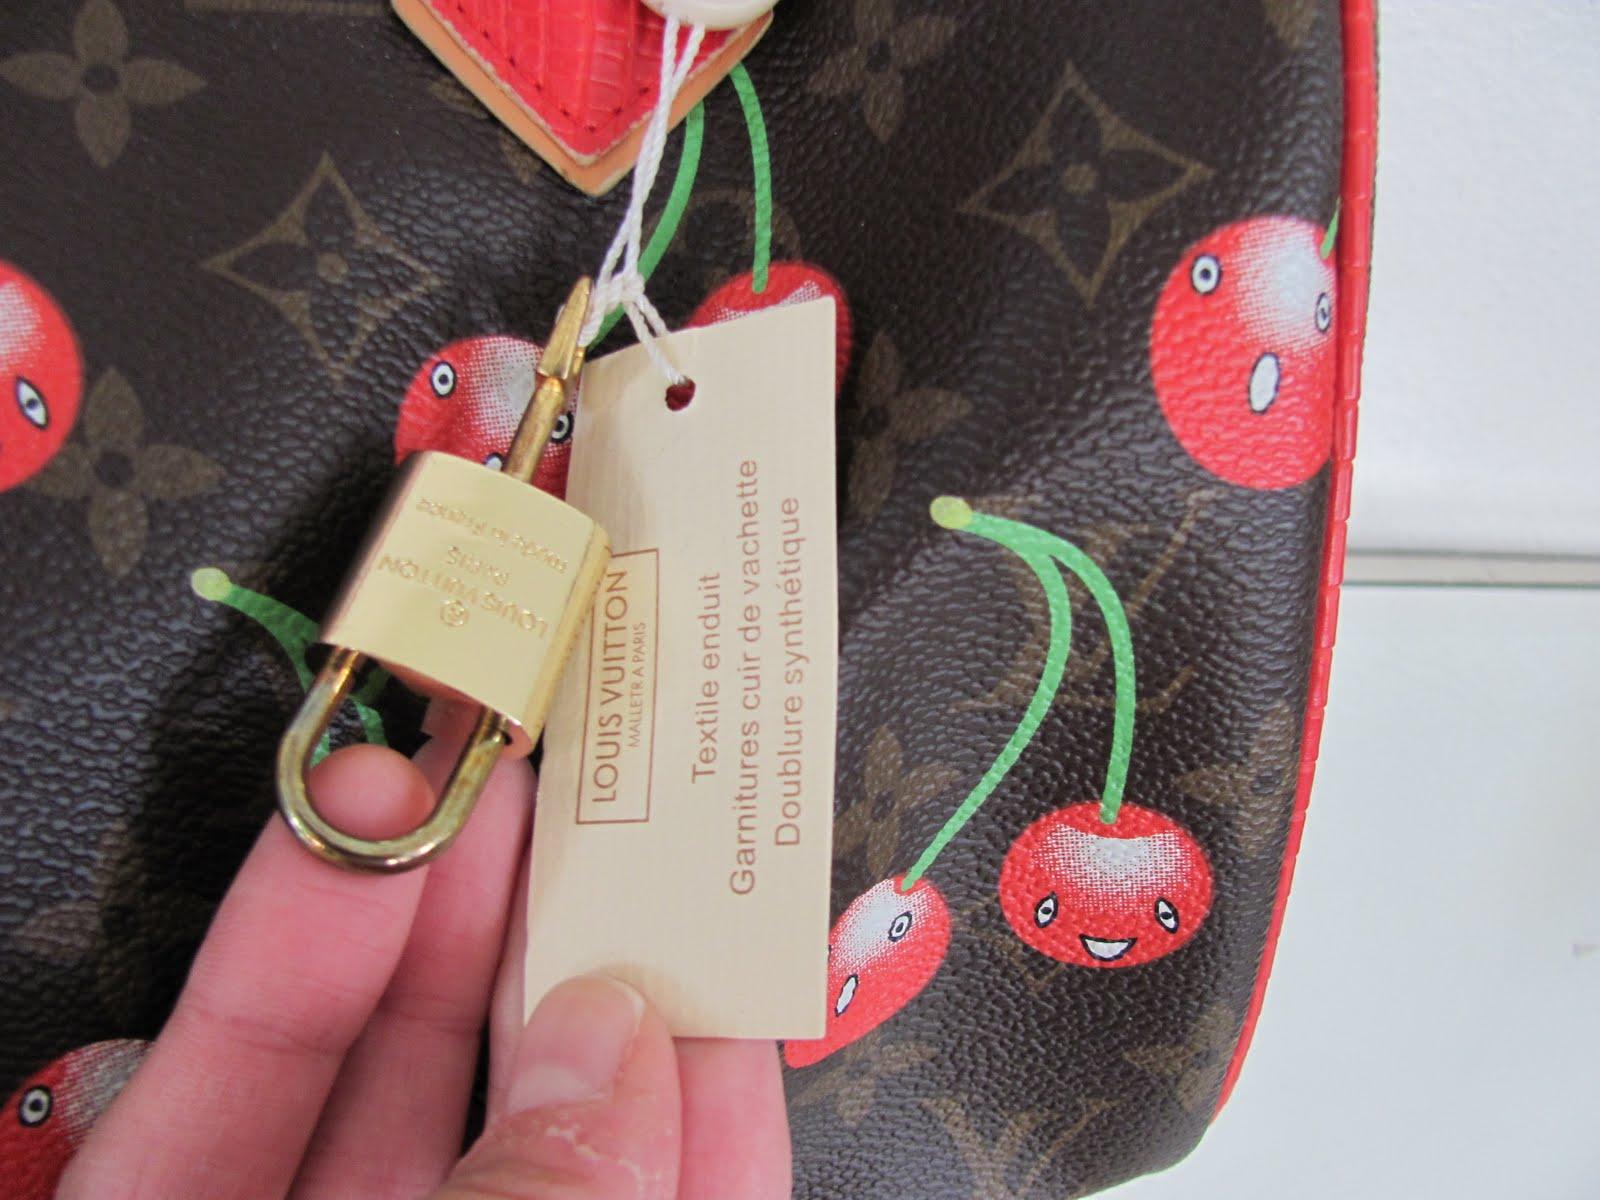 Takashi Murakami x Luis Vuitton Collab Cherry Handbag/Purse